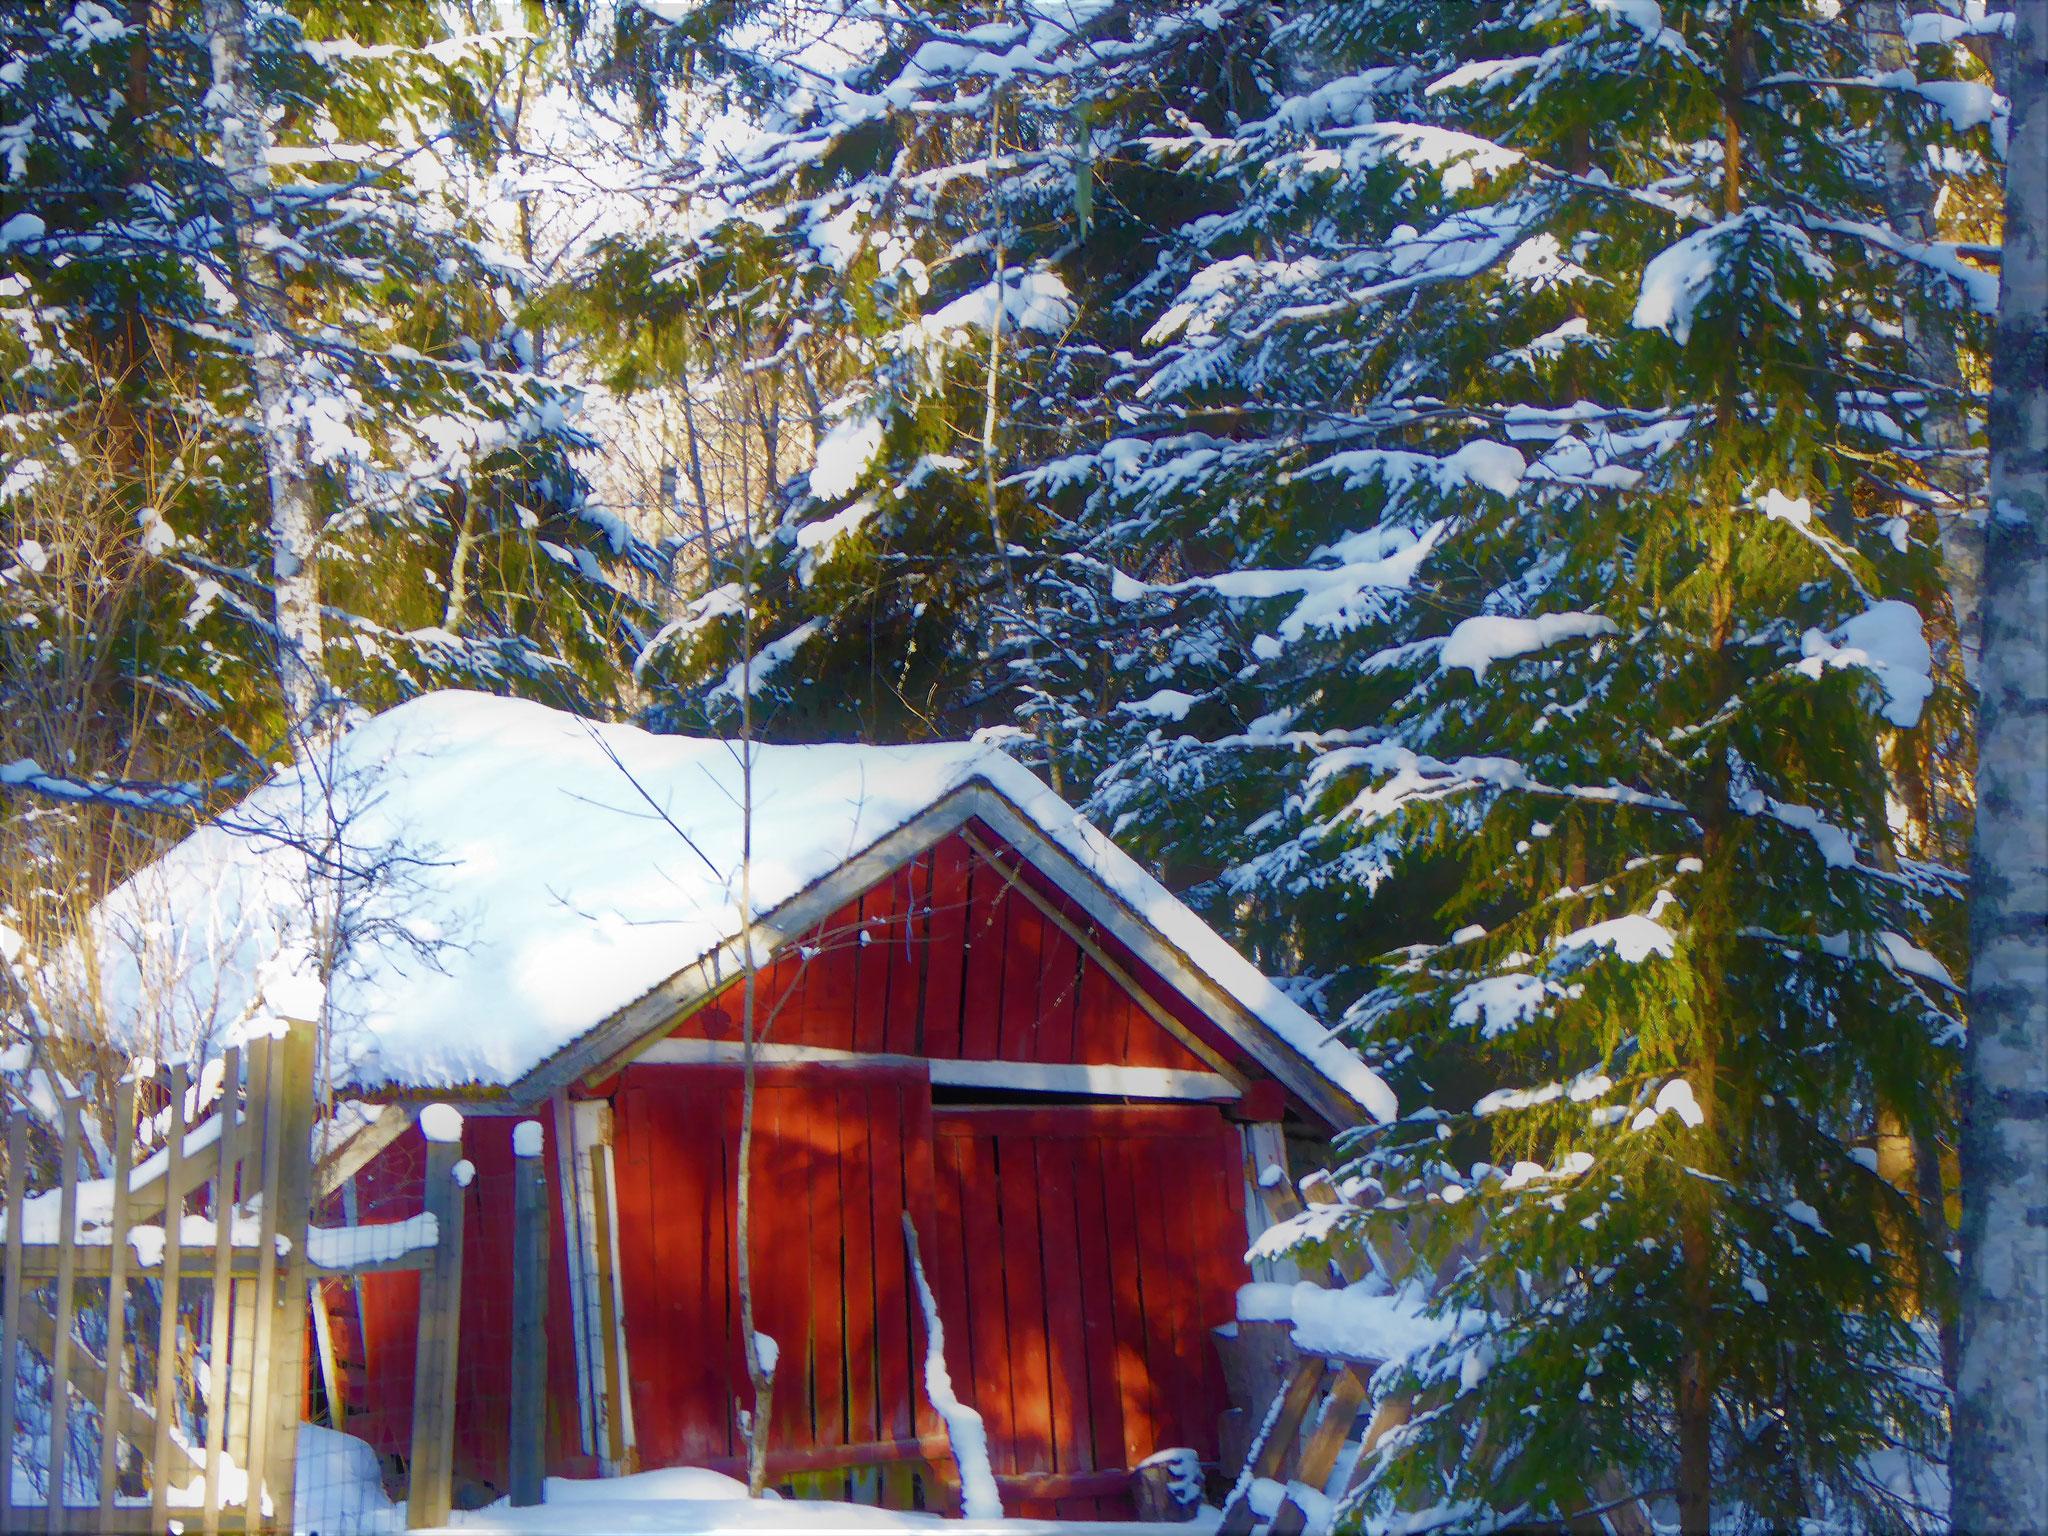 Enjoy idyllic scenes on hiking trails in winter